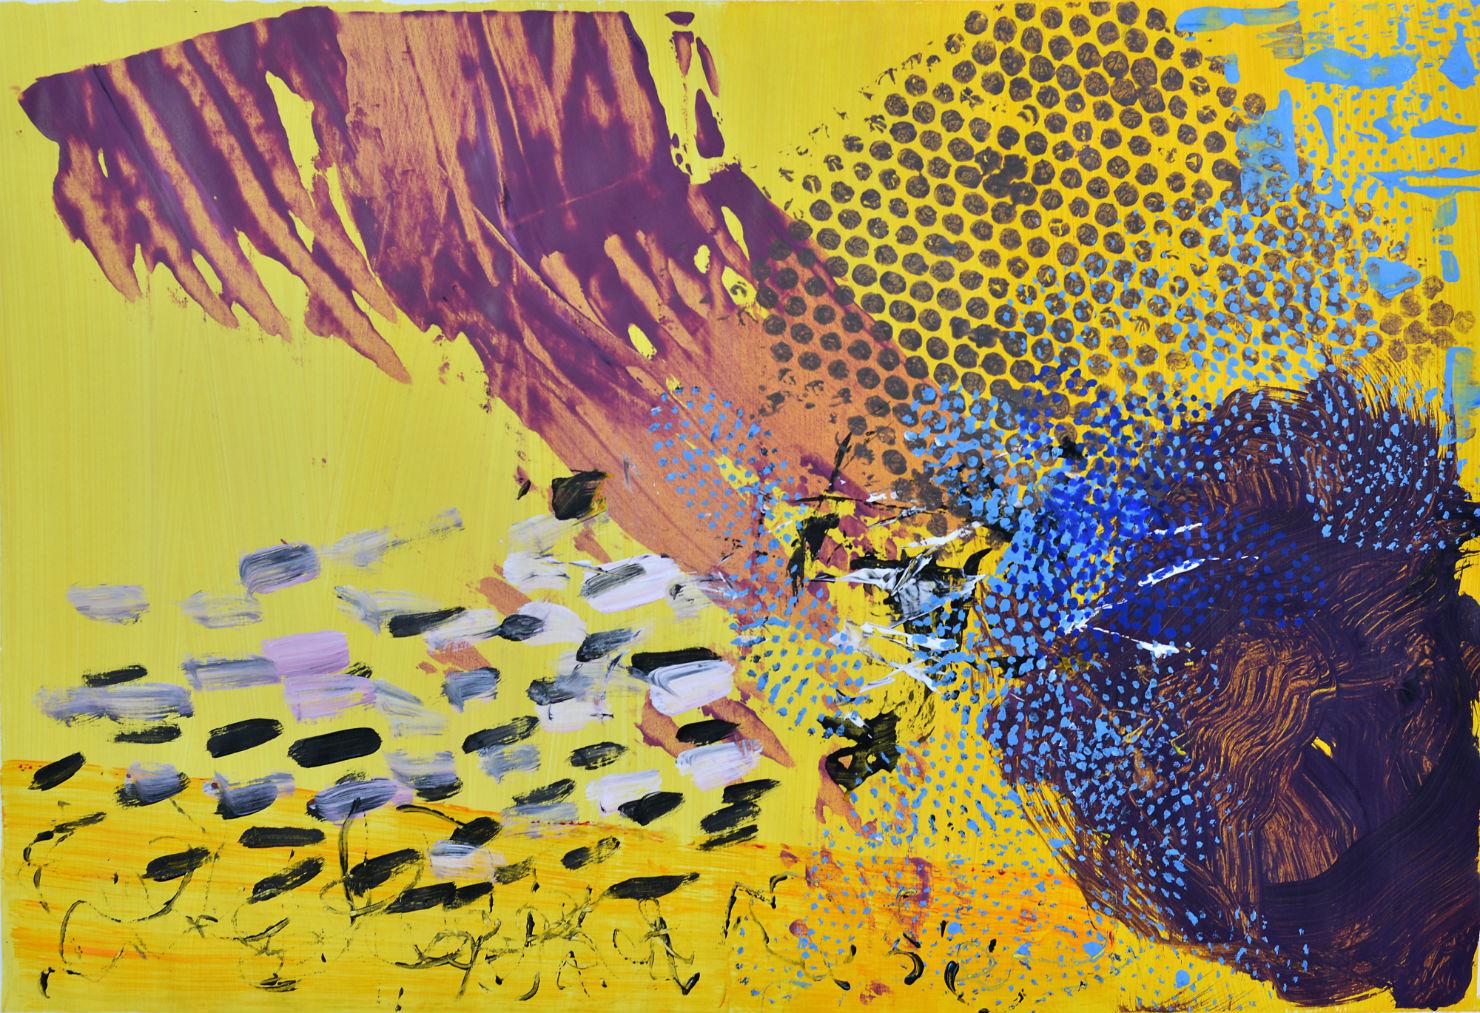 Sue McQueen, AK I yellow, Acrylic on paper.